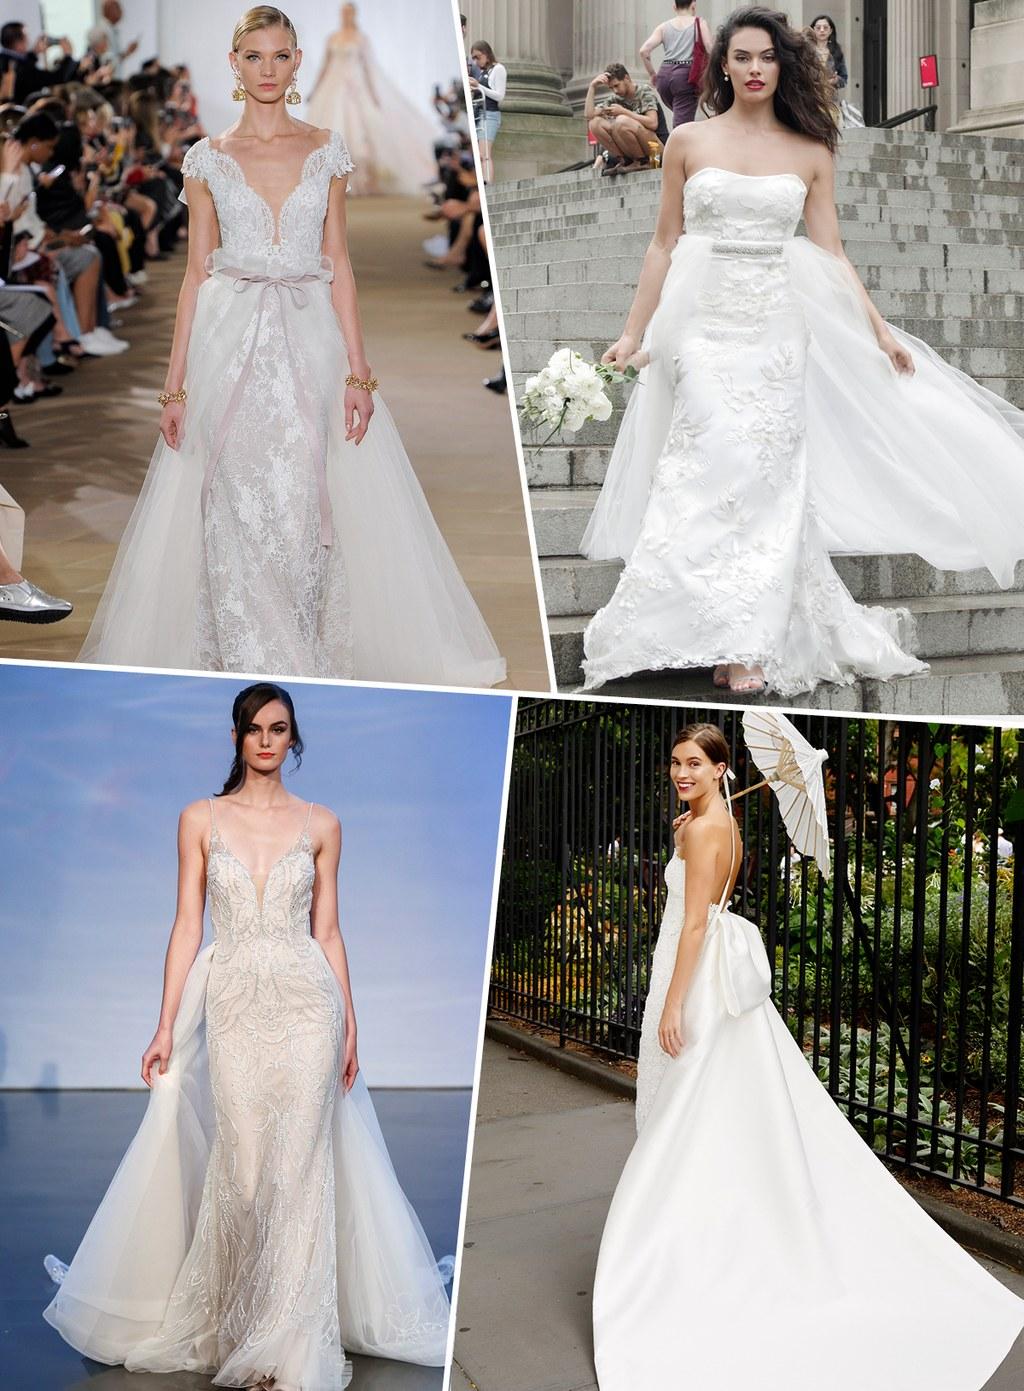 Bridalbliss.com | Bridalbliss.com | 2019 Wedding Gown Trends | Martha Stewart Weddings